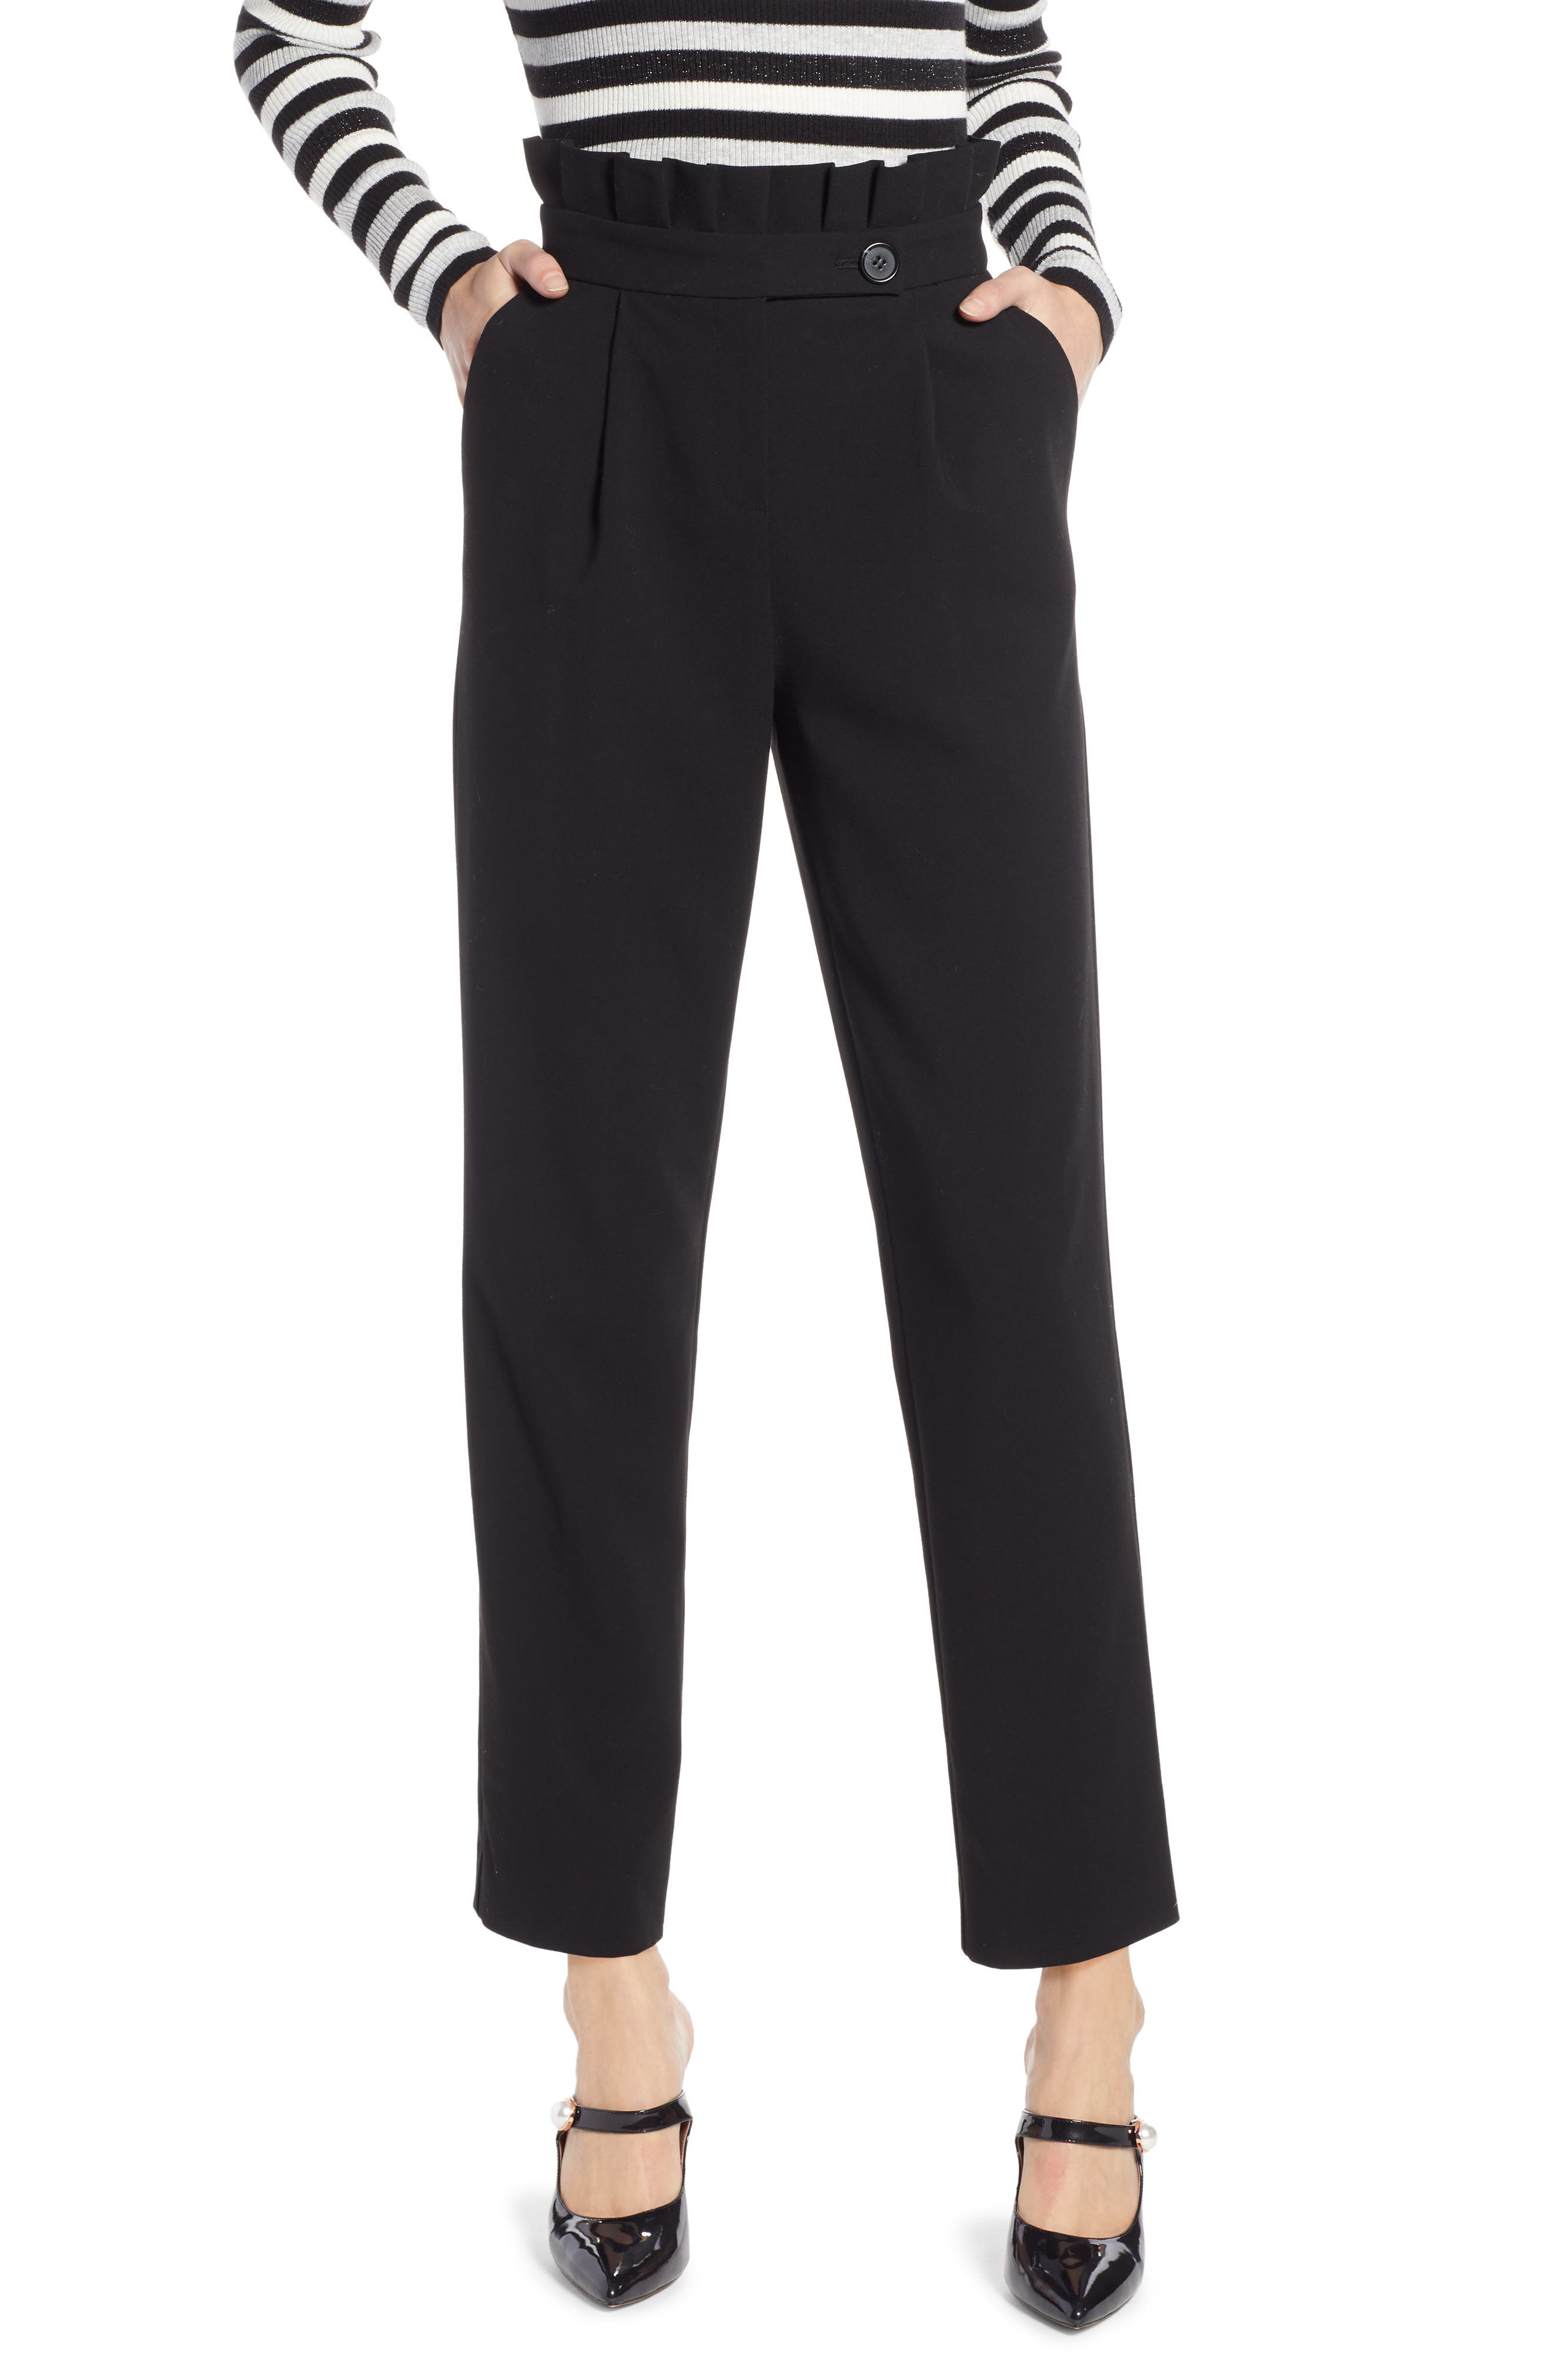 x Atlantic-Pacific Ruffle Waist Ankle Pants,                         Main,                         color, 001